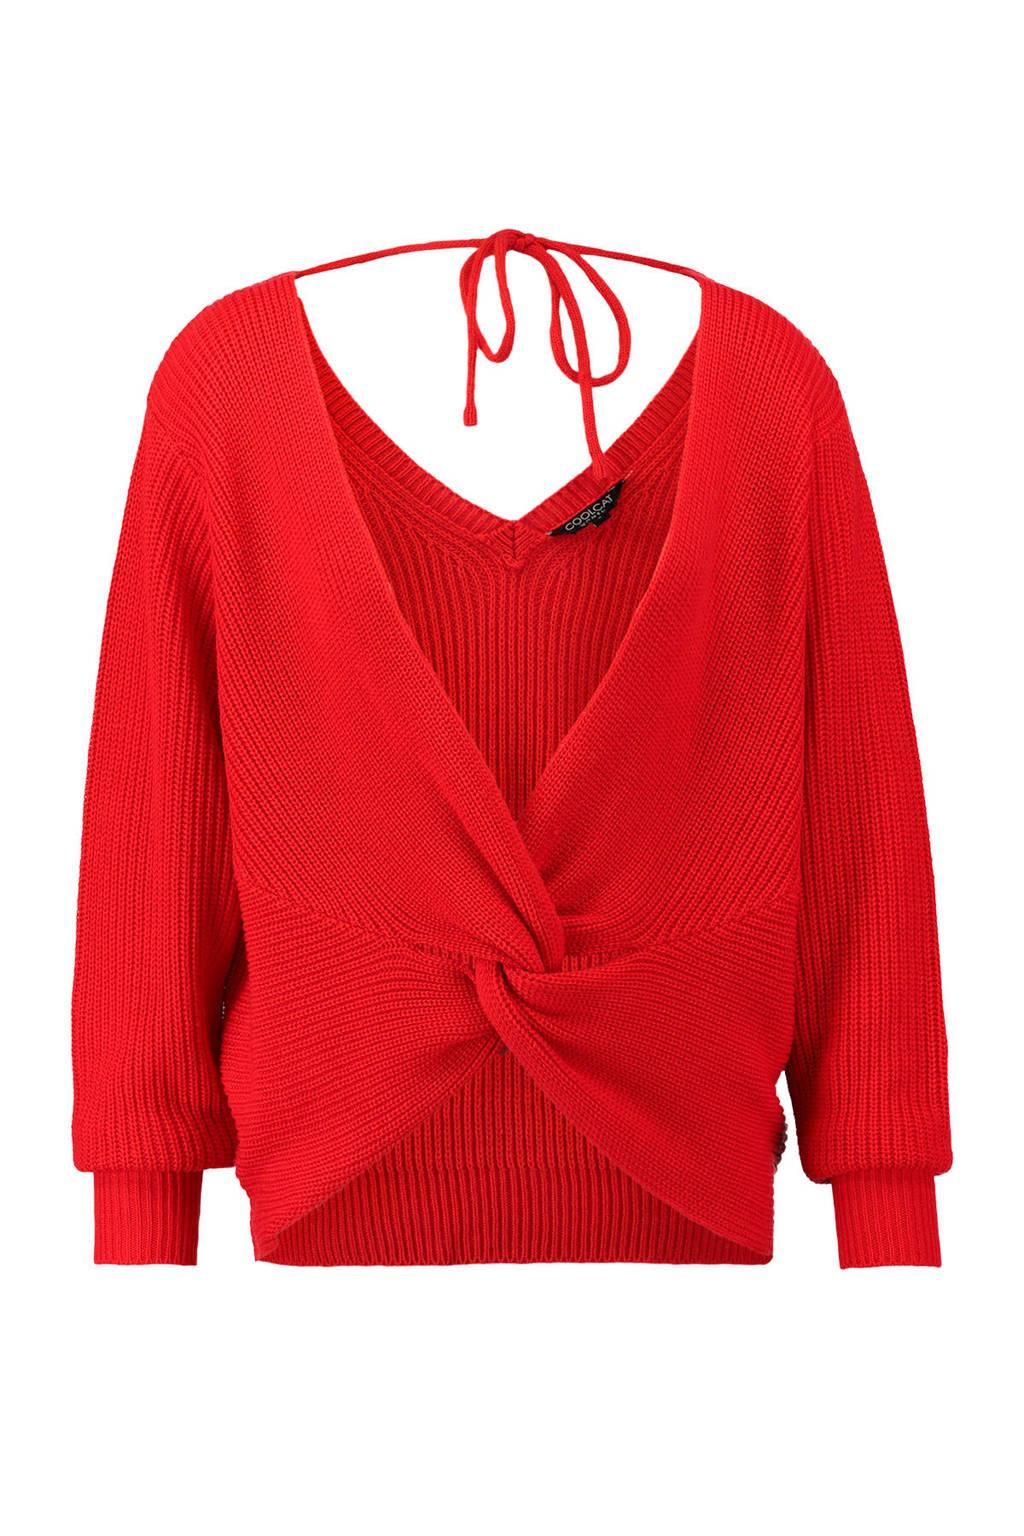 CoolCat gebreide trui met knoopdetail rood, Rood